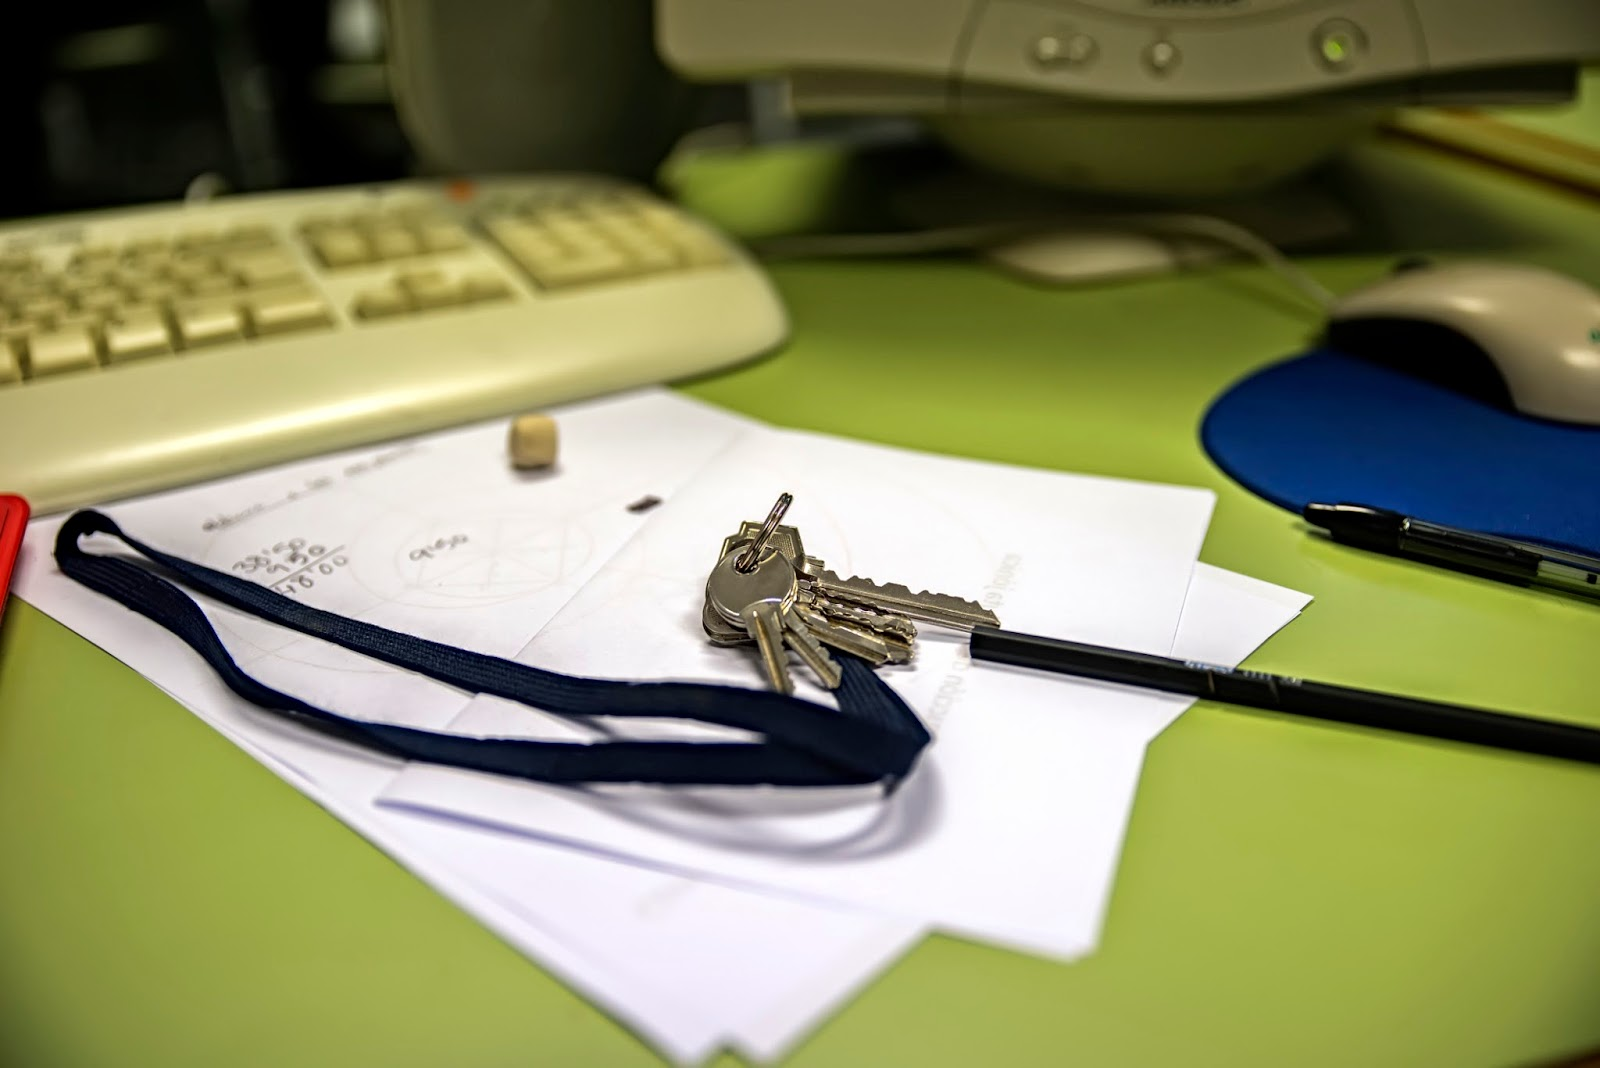 keys left on a desk